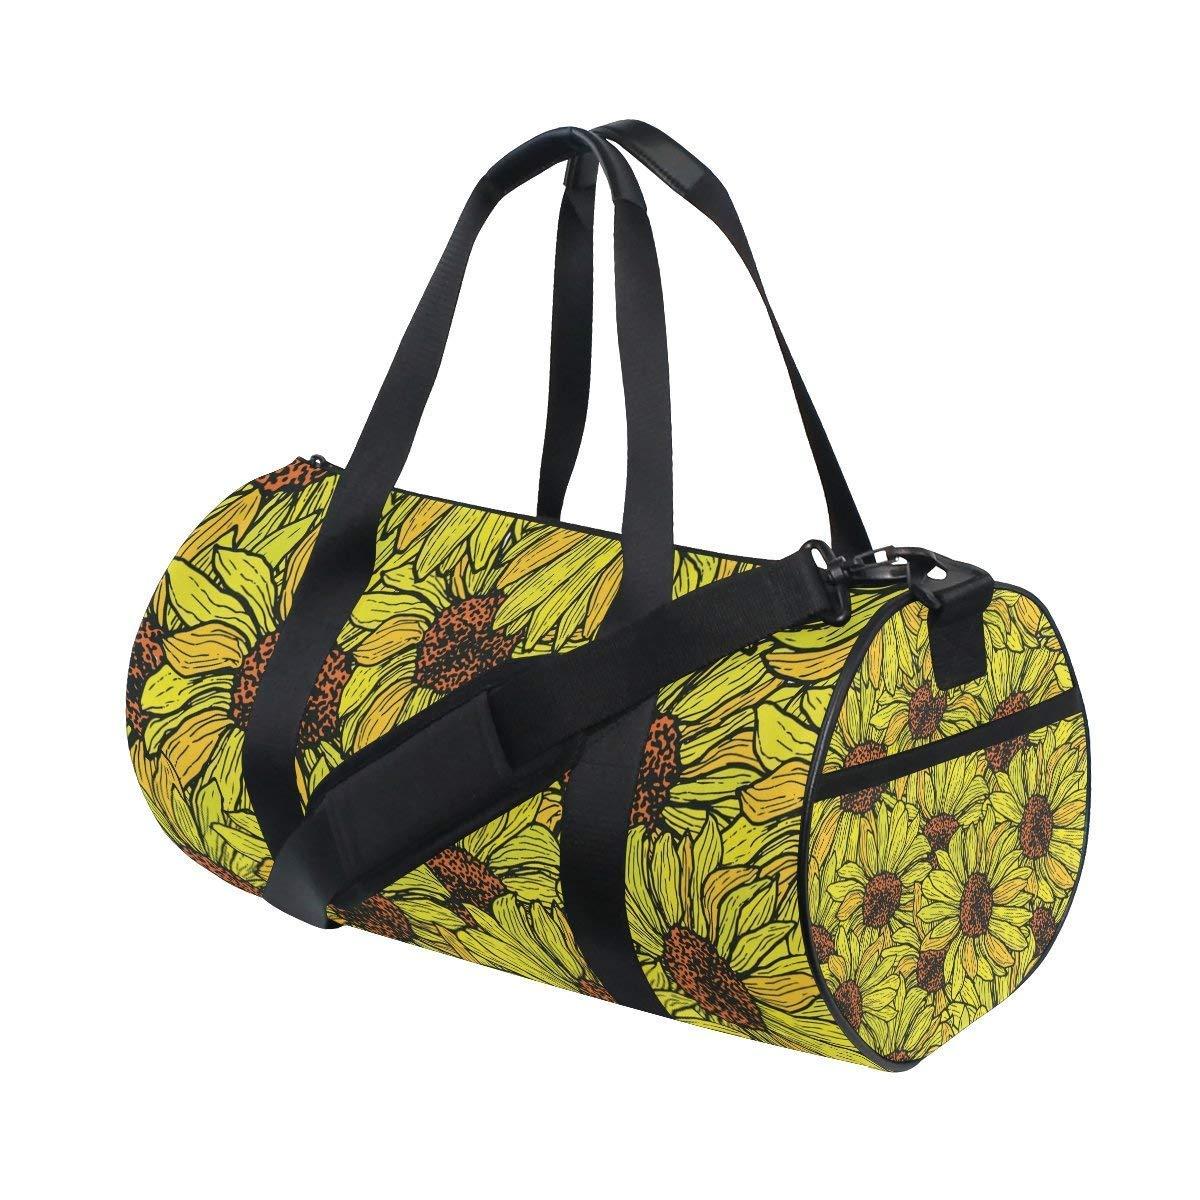 Gym Duffel Bag Watercolor Sunflower Sports Lightweight Canvas Travel Luggage Bag